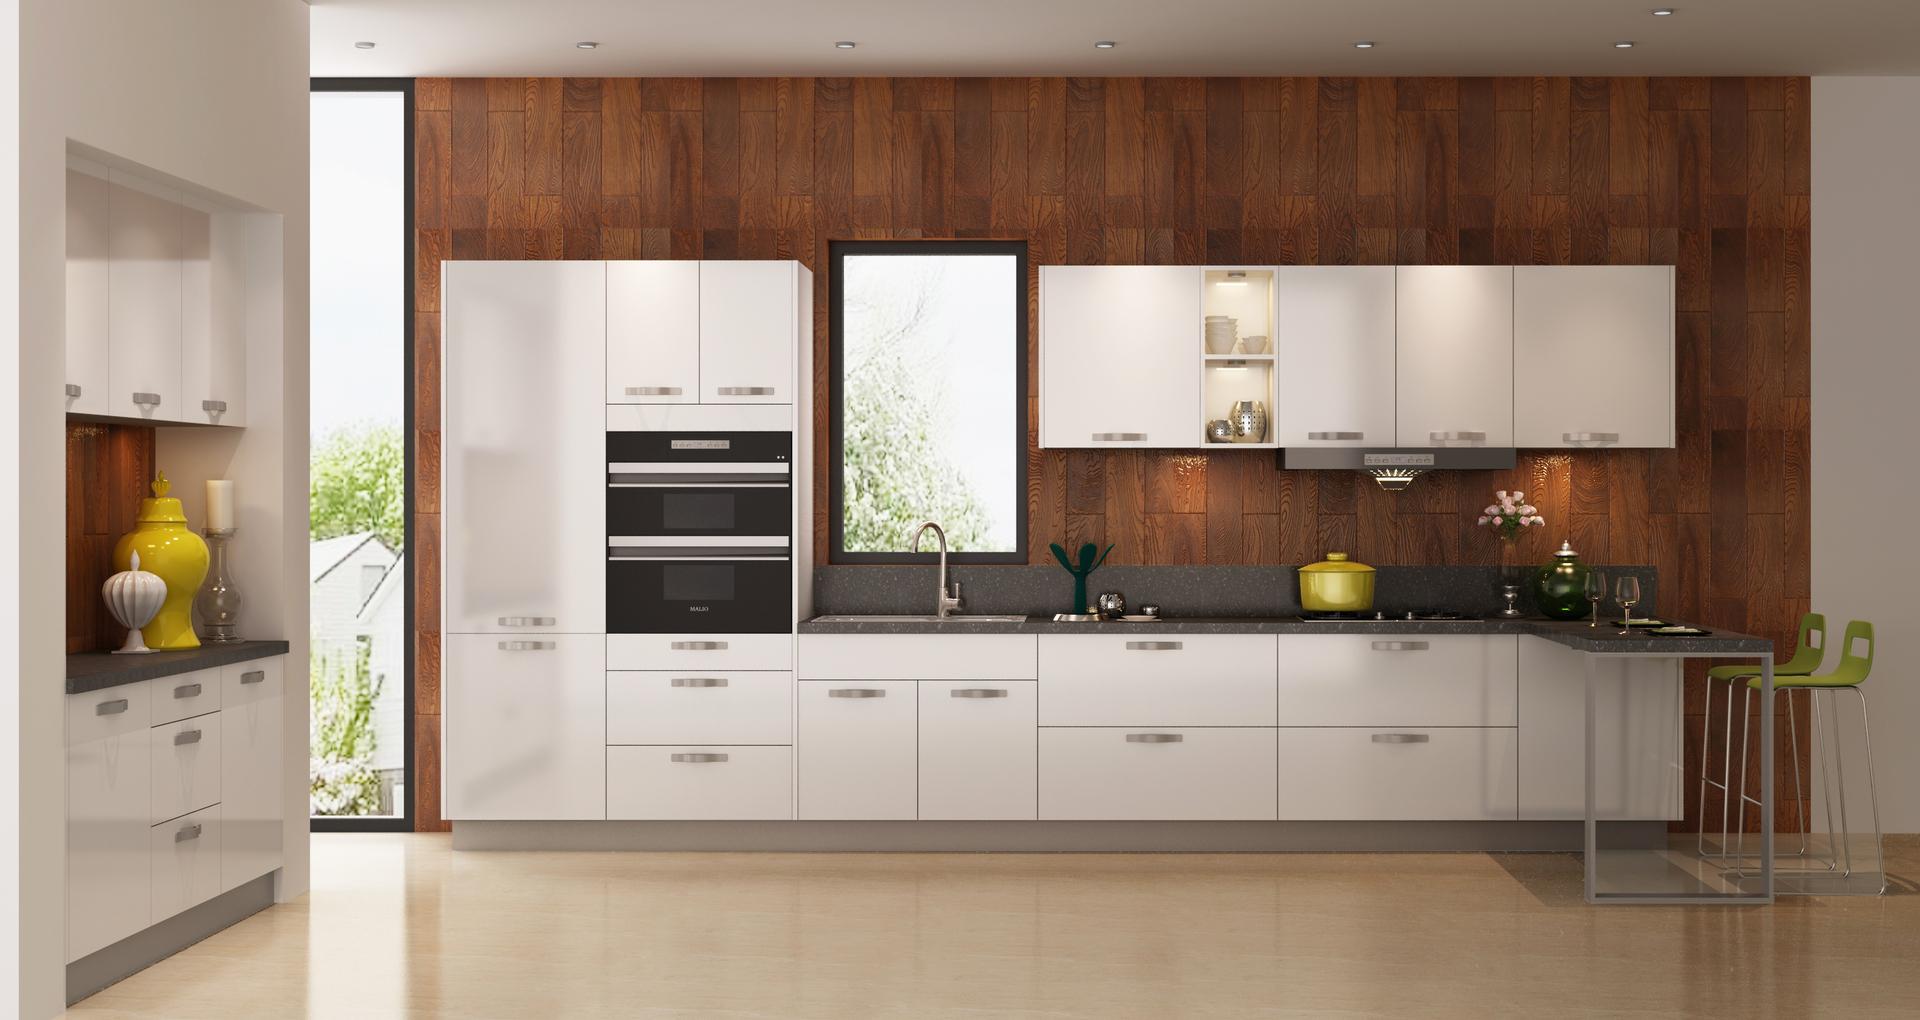 cabinets fort lauderdale, fl | kitchen cabinets | bathroom cabinets